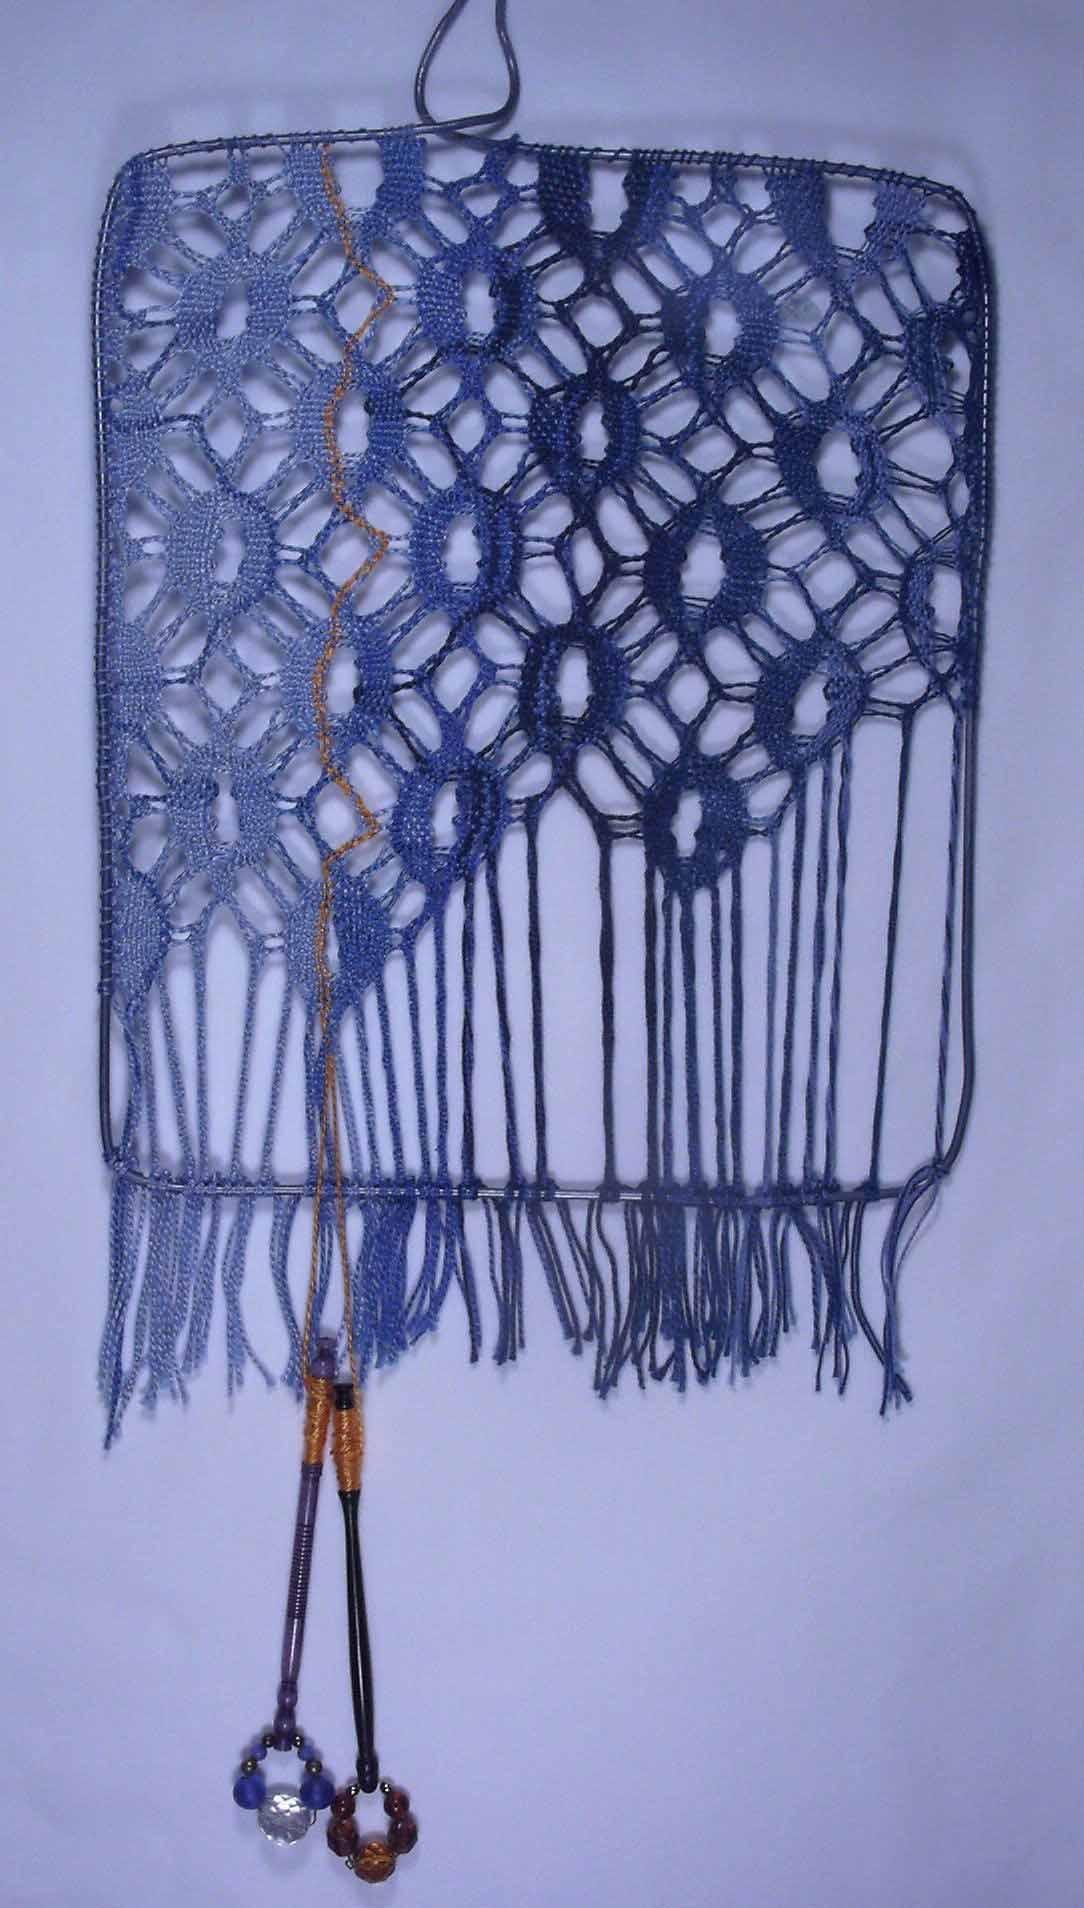 Binche filling hanging